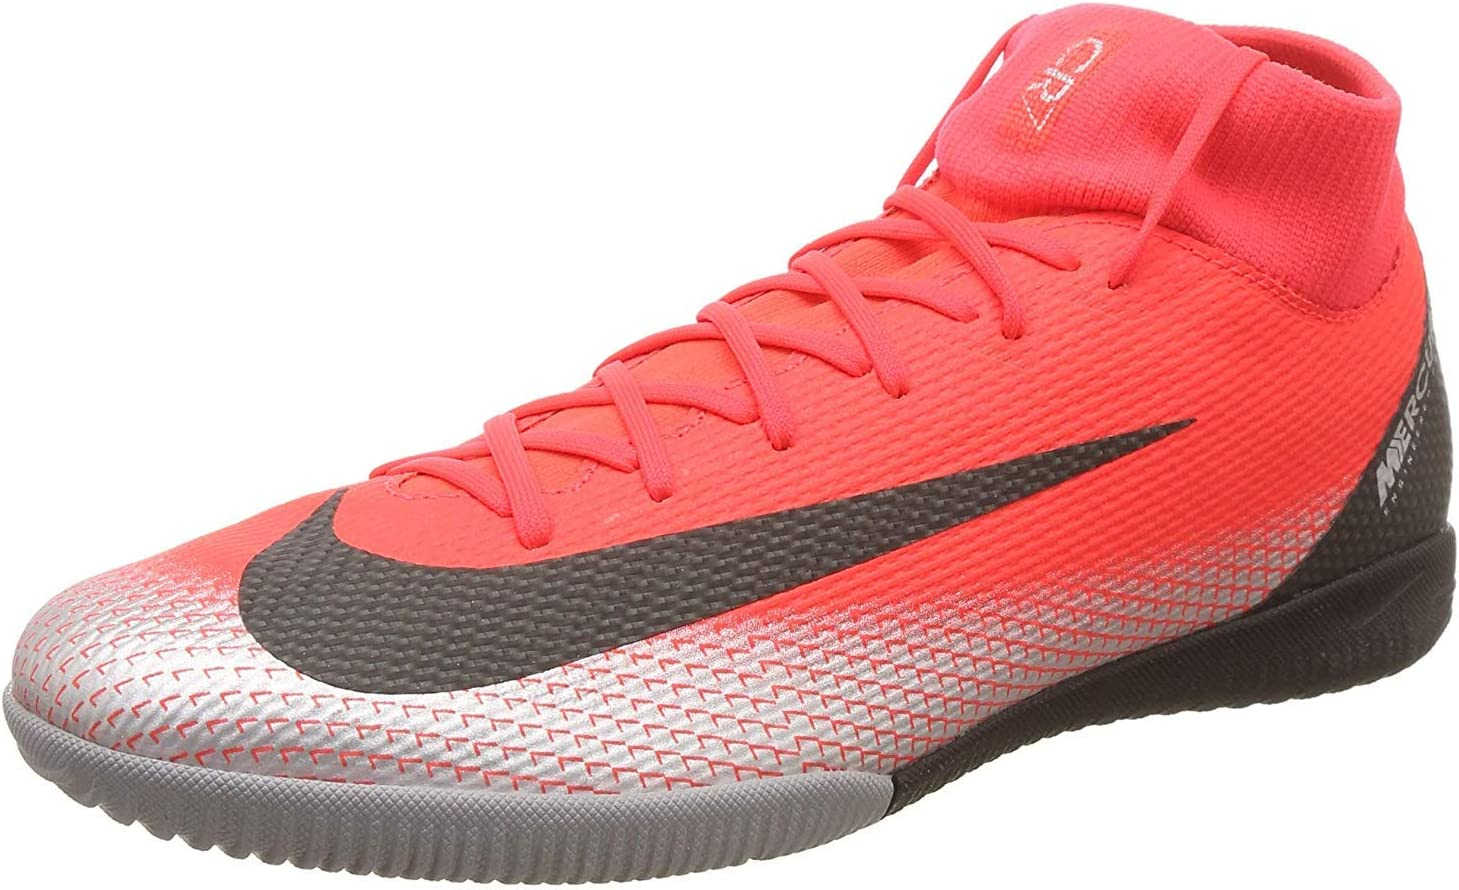 Nike Superfly X6 IC Elite CR7 Indoor